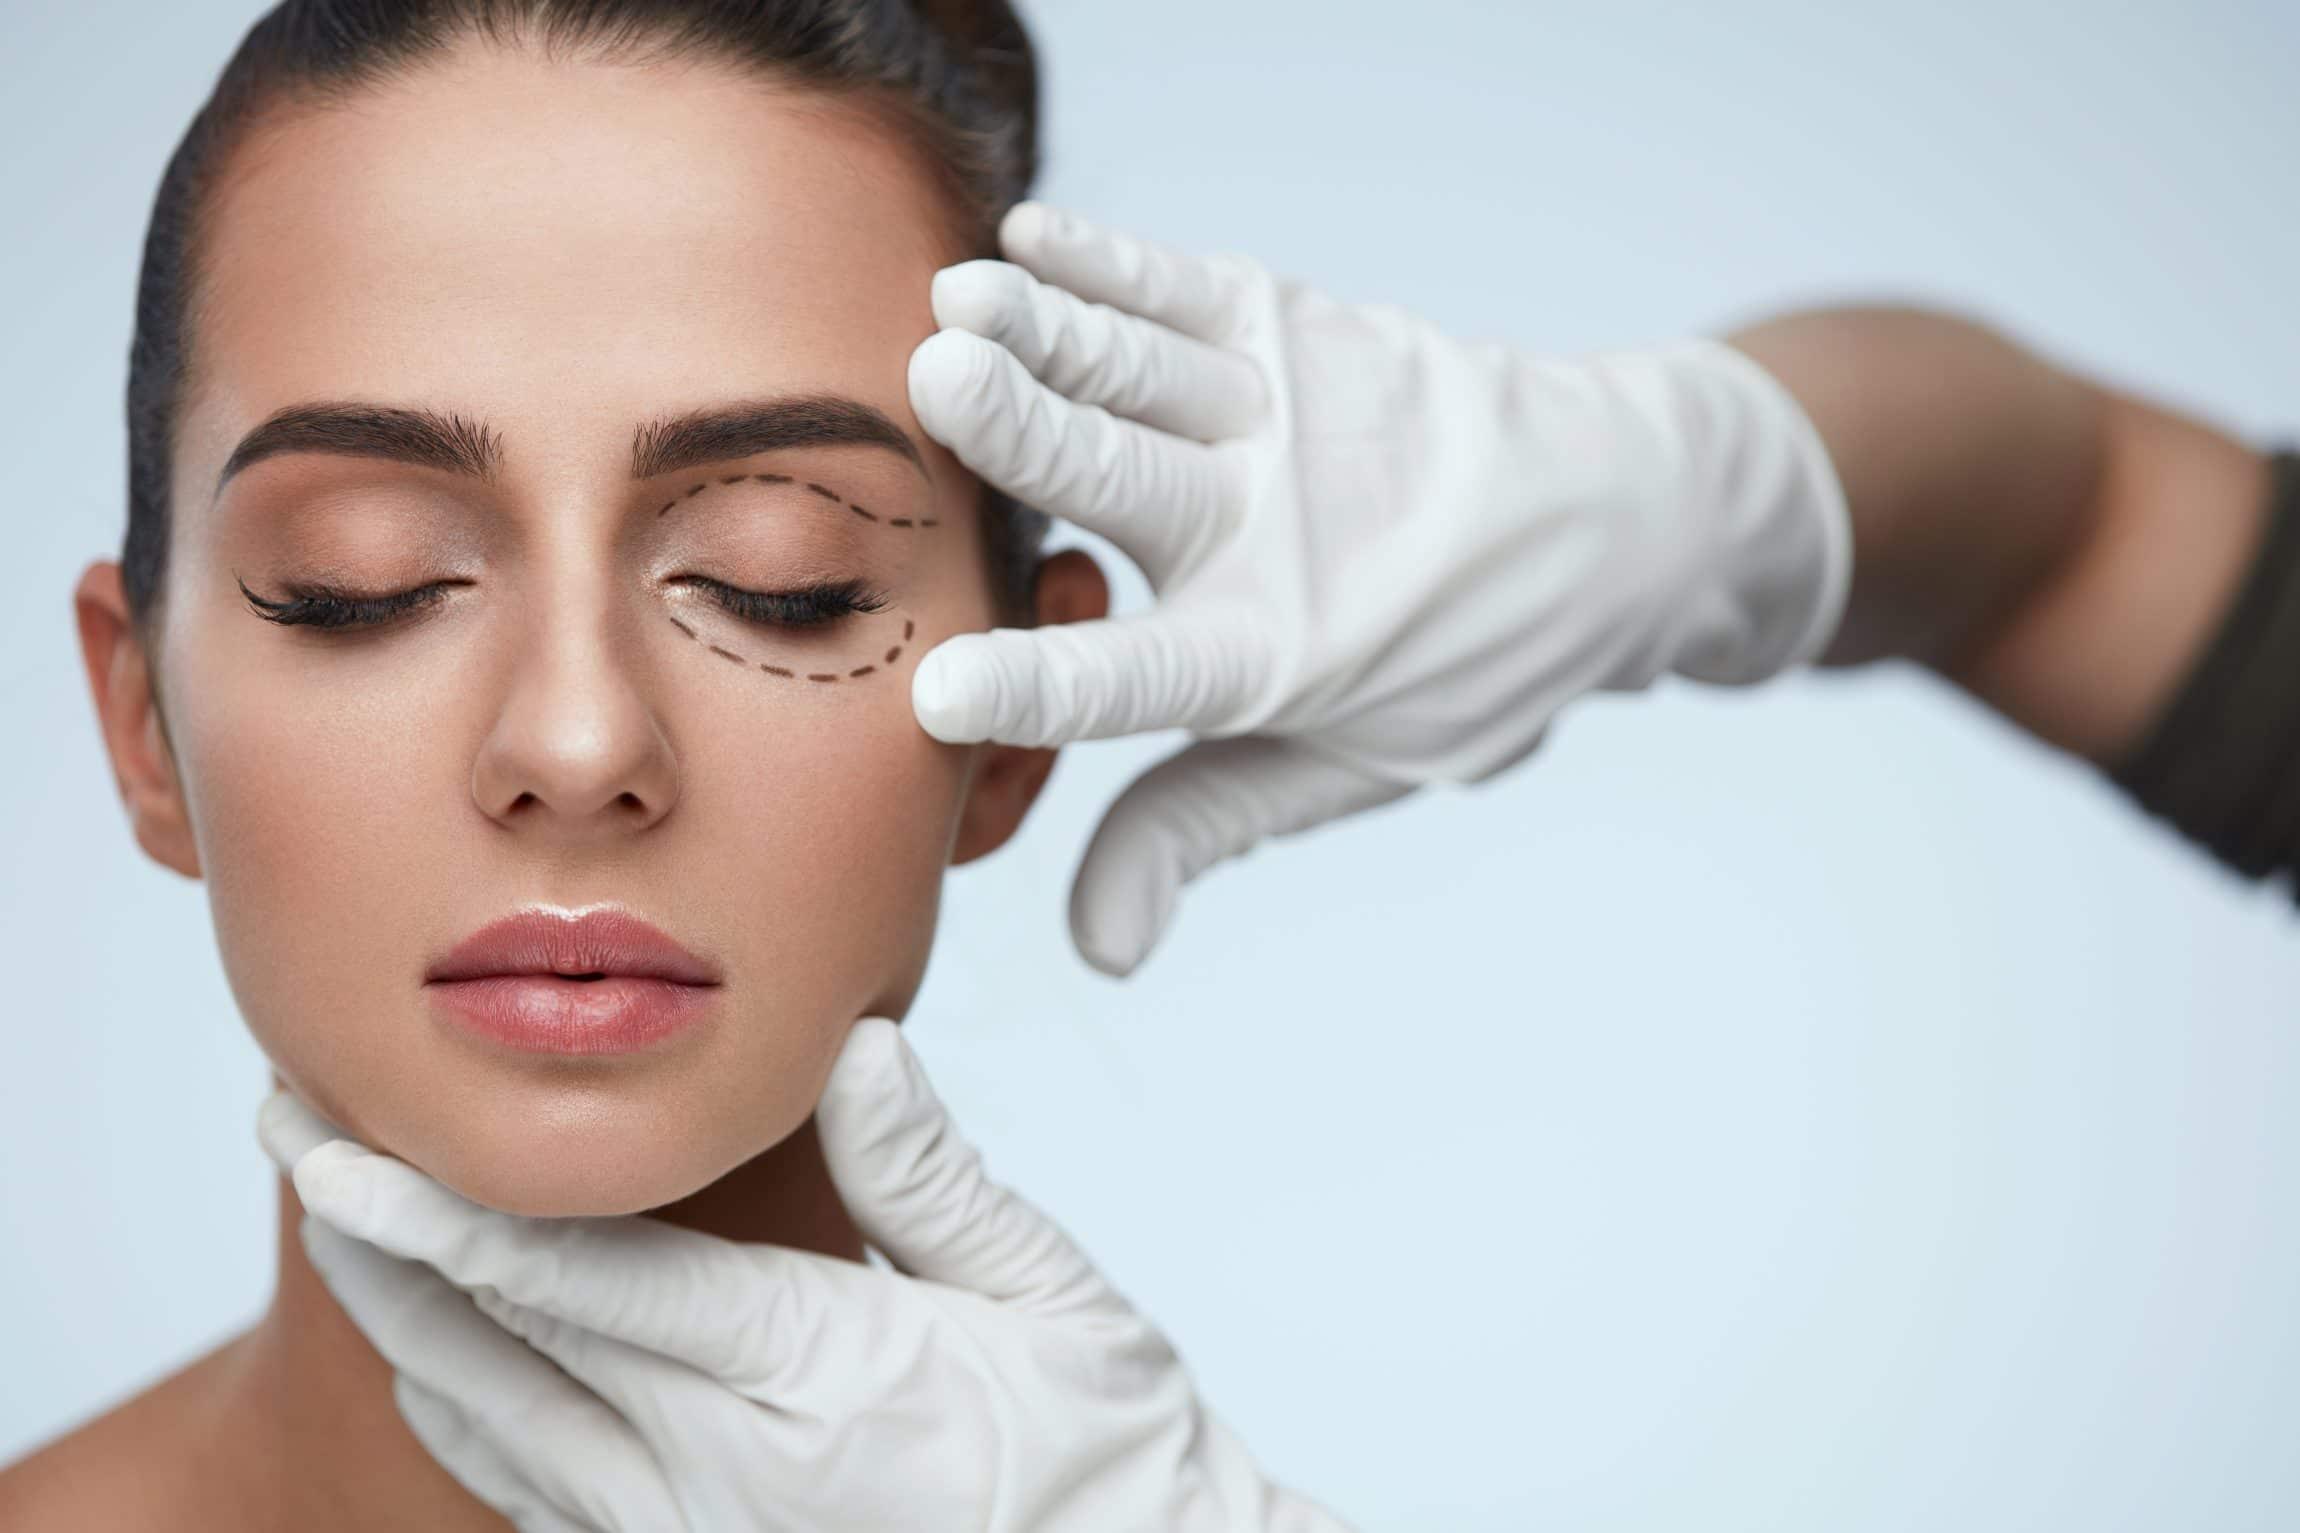 Eye Lid Surgery / Blephoraplasty Medical Considerations